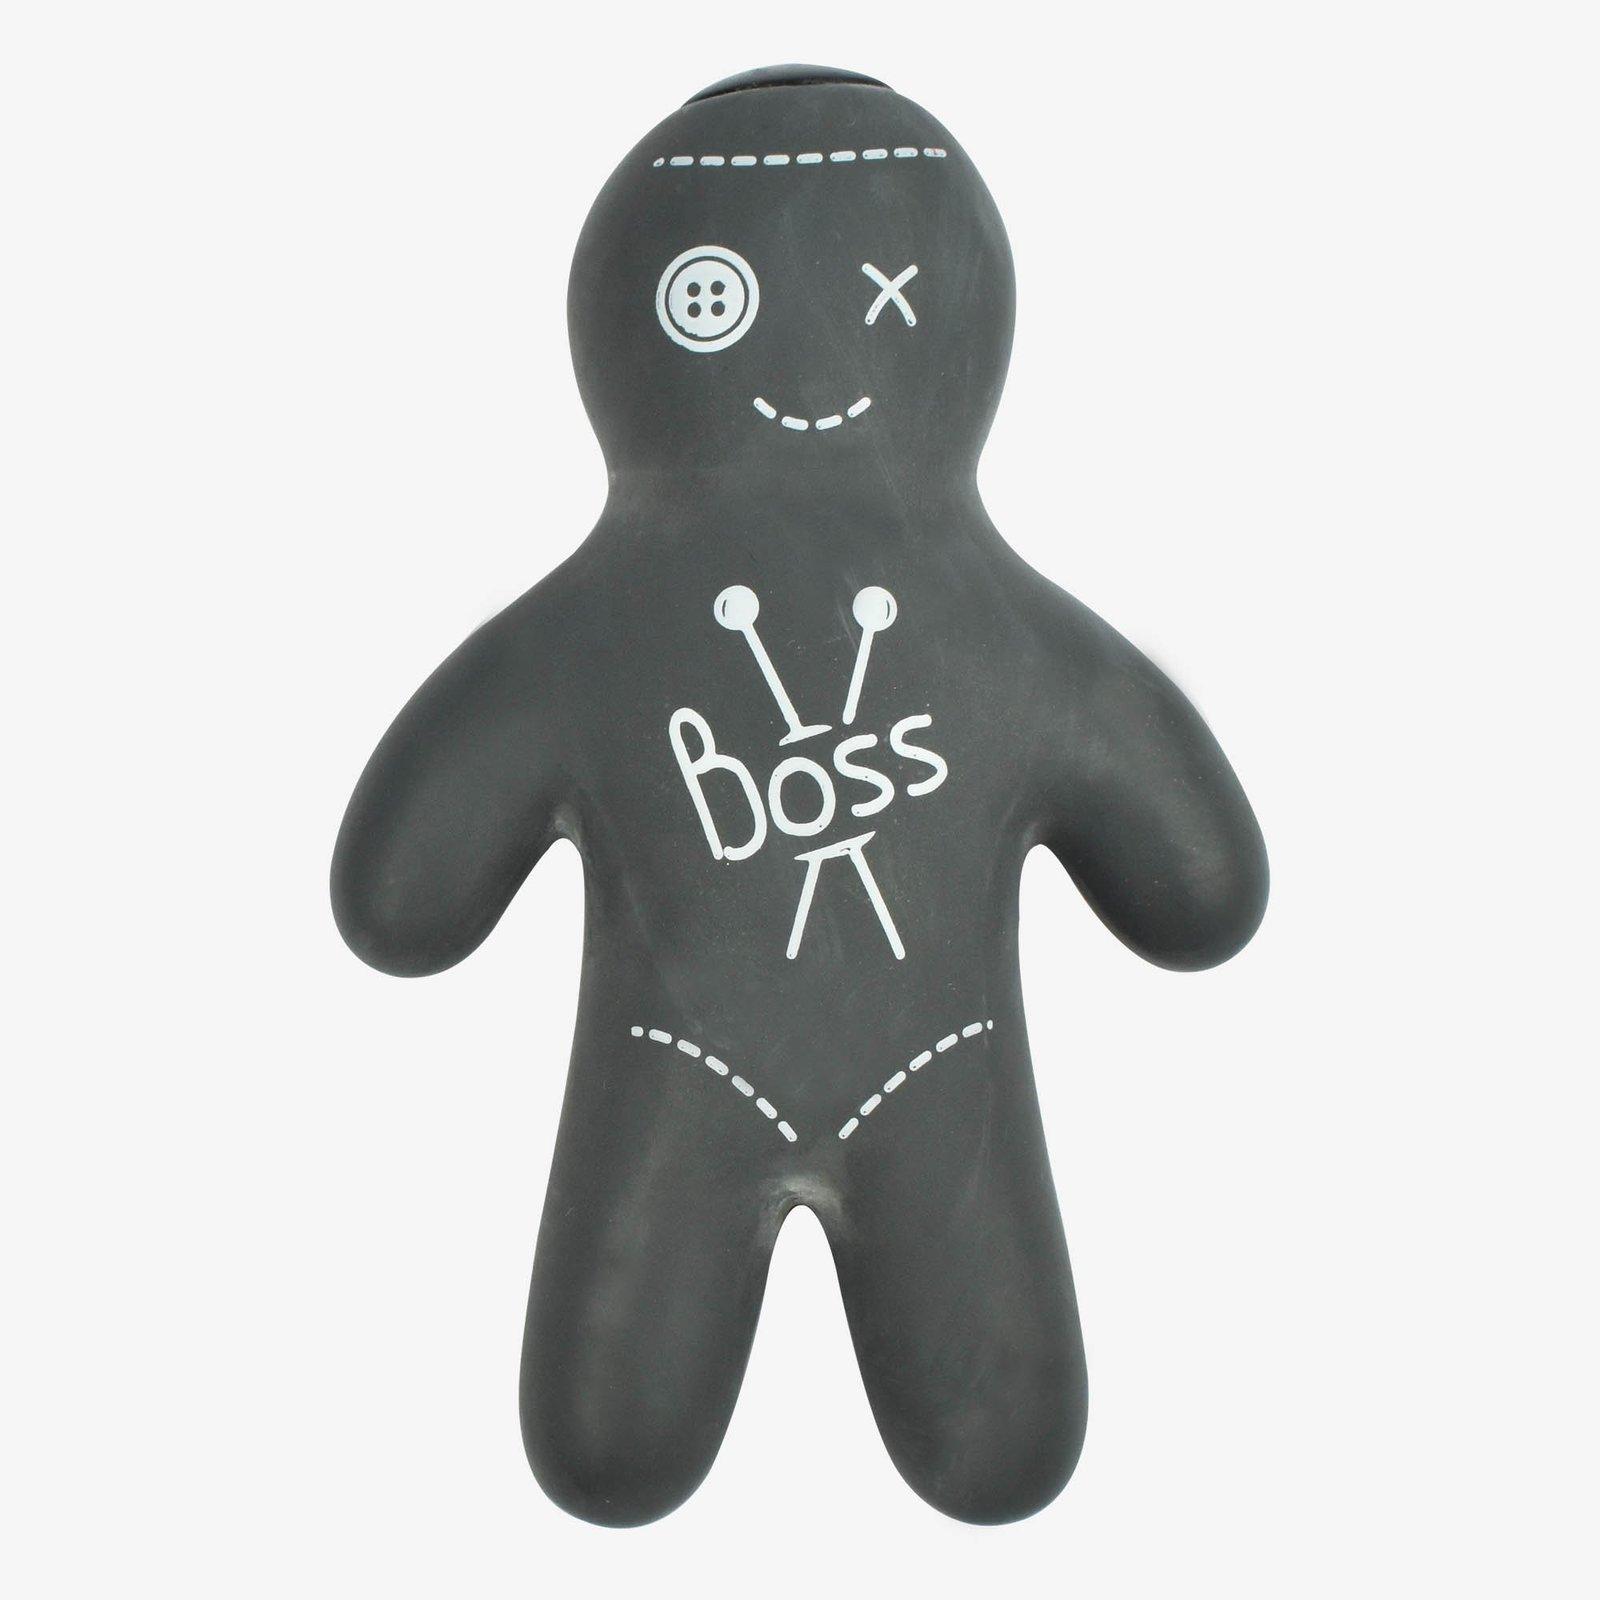 Legami: Antistress Ball - Boss Voodoo Doll image